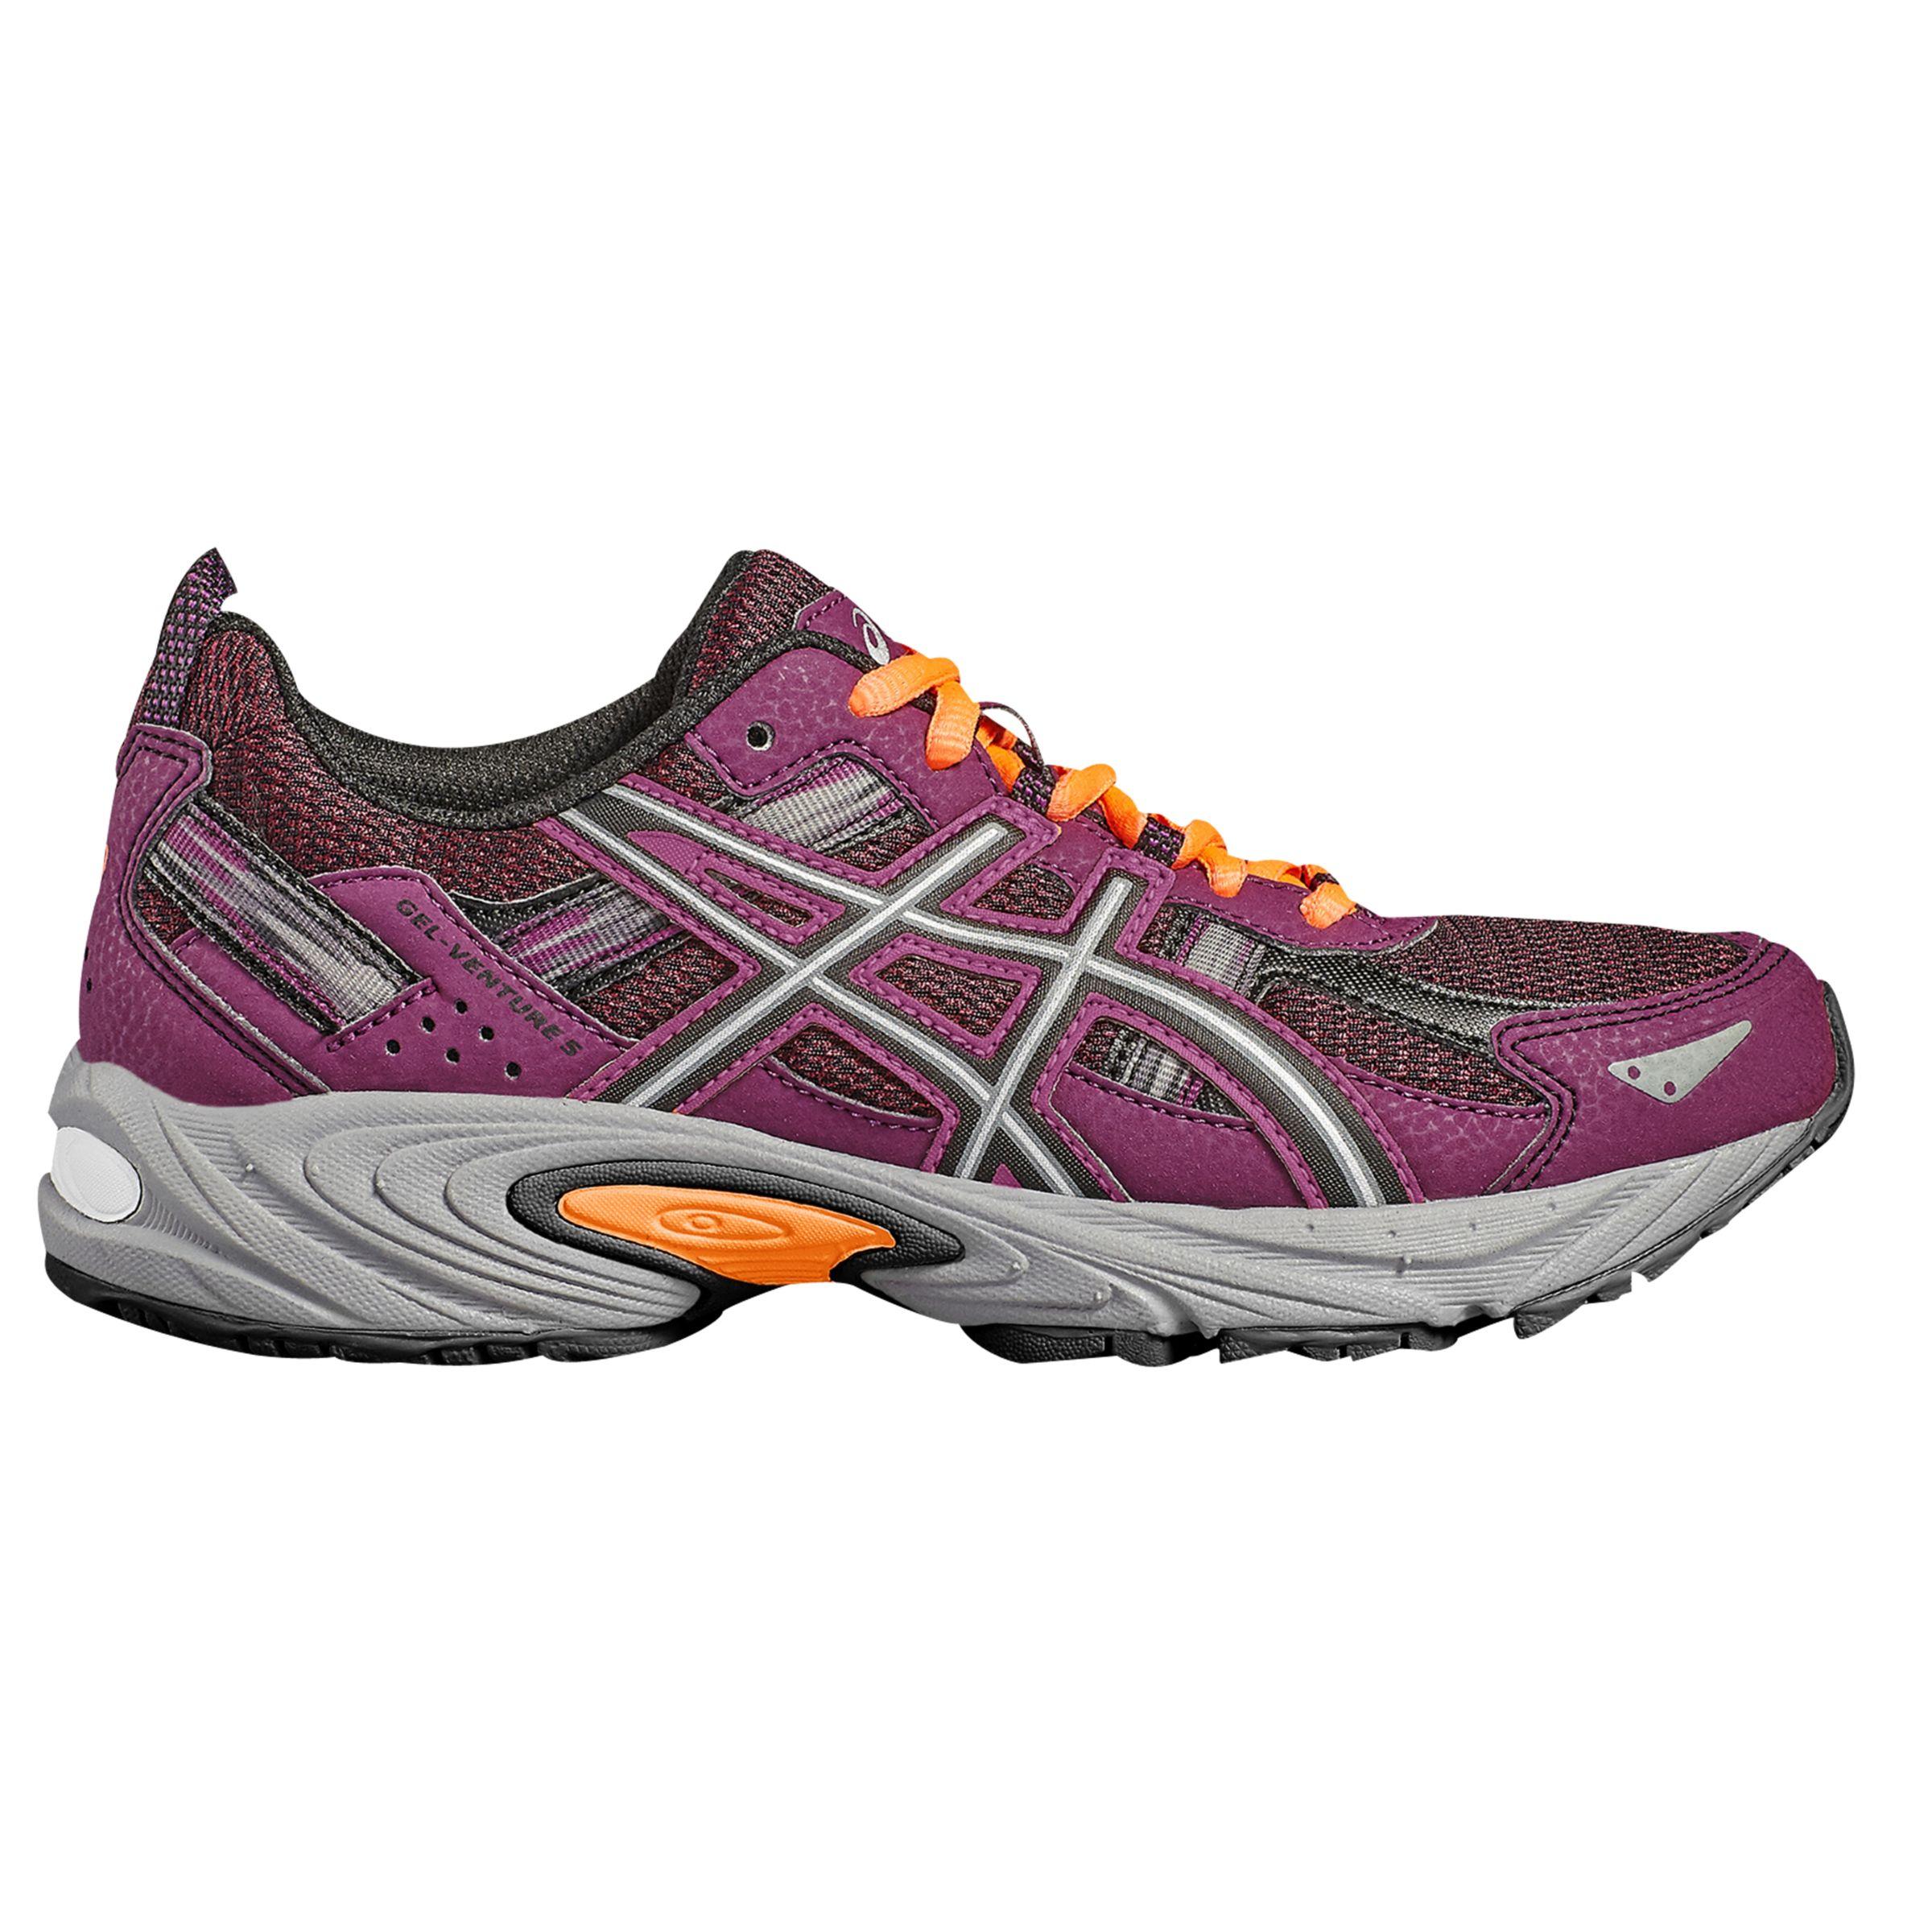 Asics GEL VENTURE 5 Women's Running Shoes, PurpleBlack at